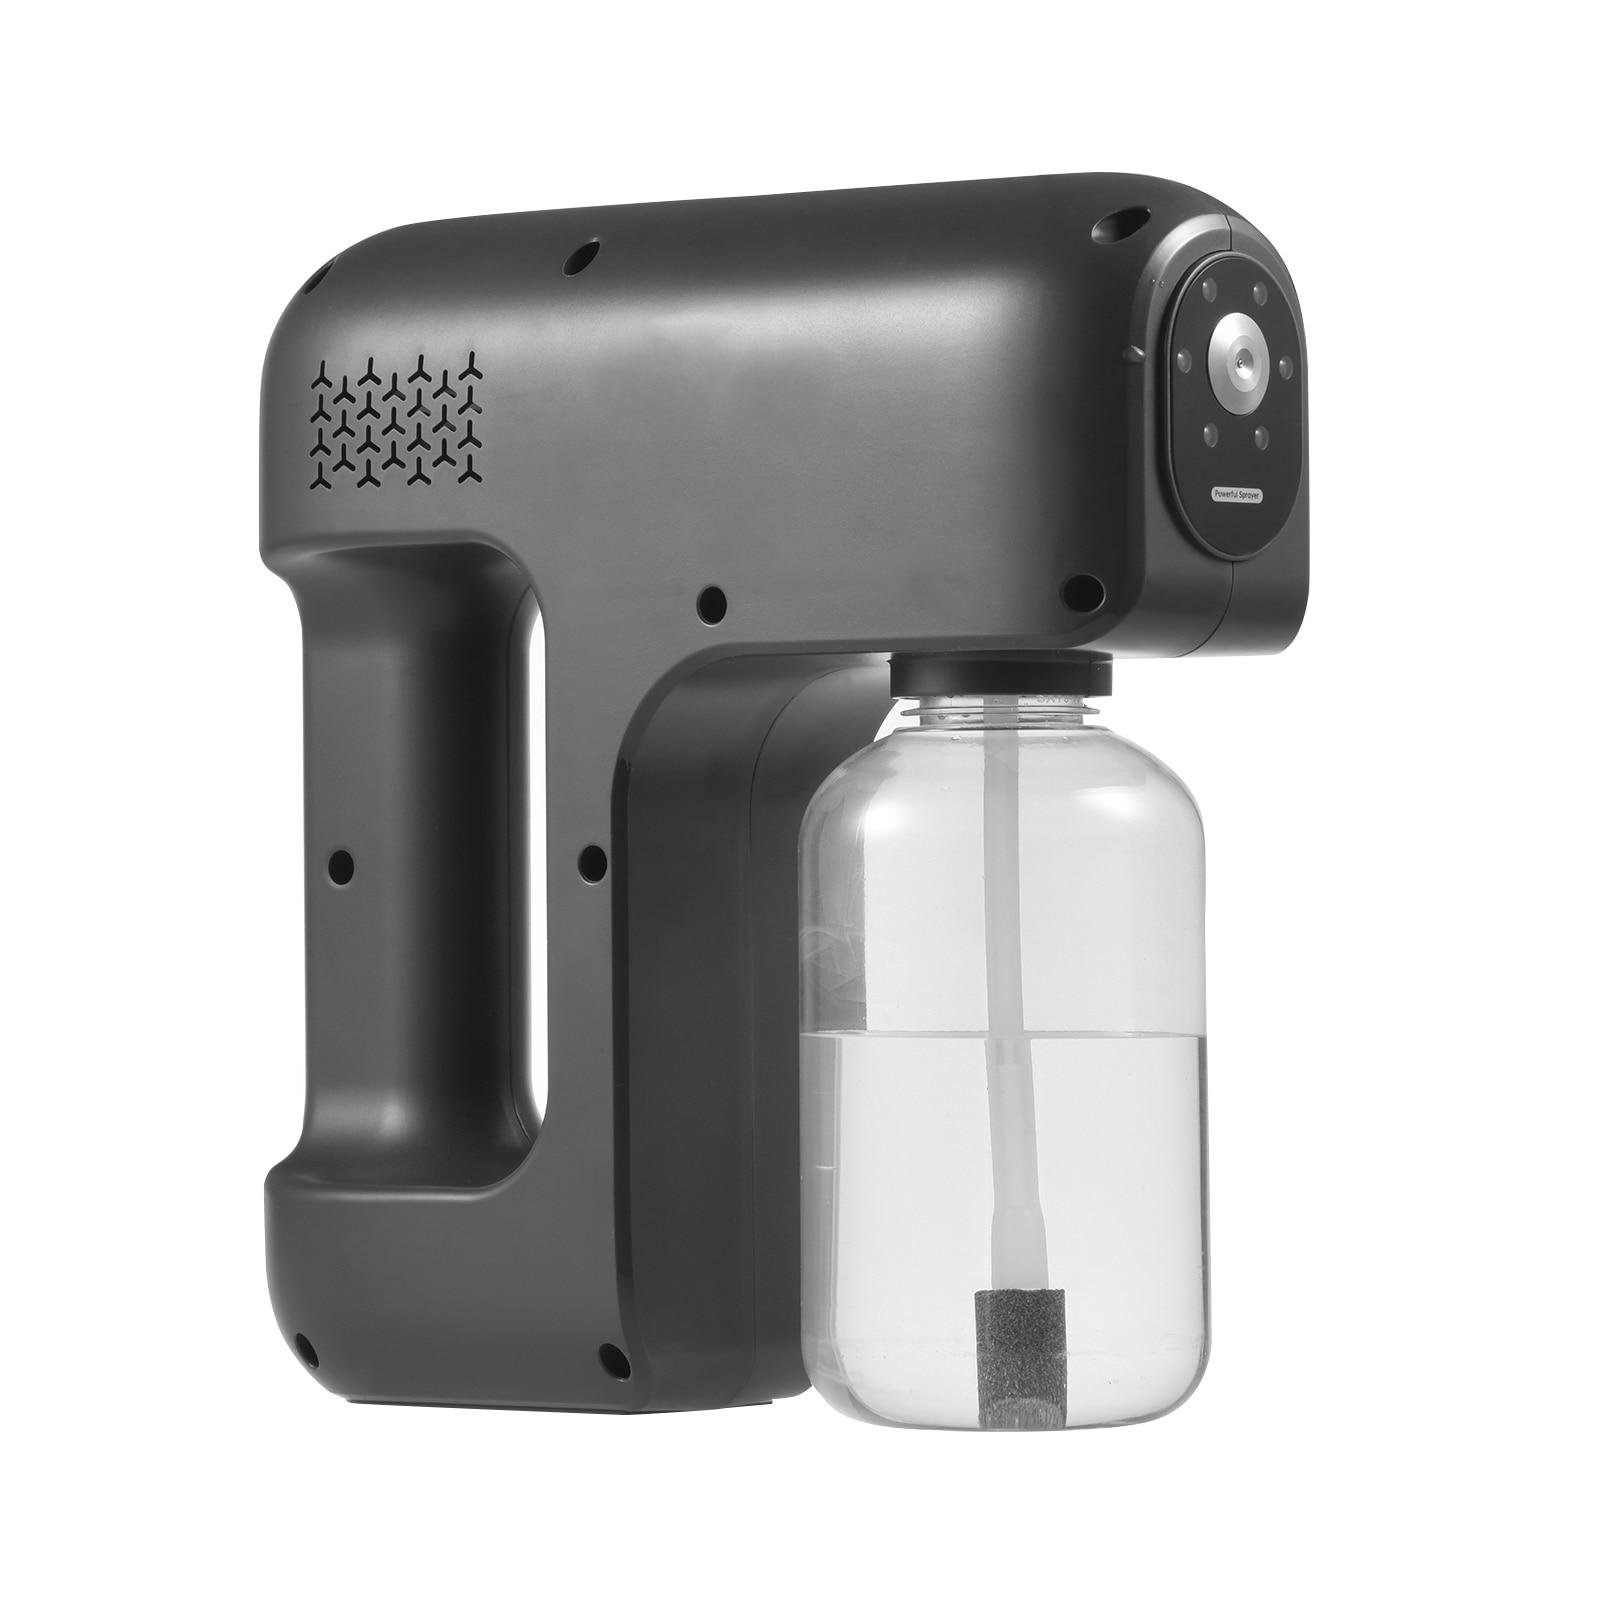 Pulverizador de Álcool Dispensador de Álcool Elétrica Automática Nano Névoa Pulverizador Atomização Pistola Usb Rechargeble Portátil 25w 400ml